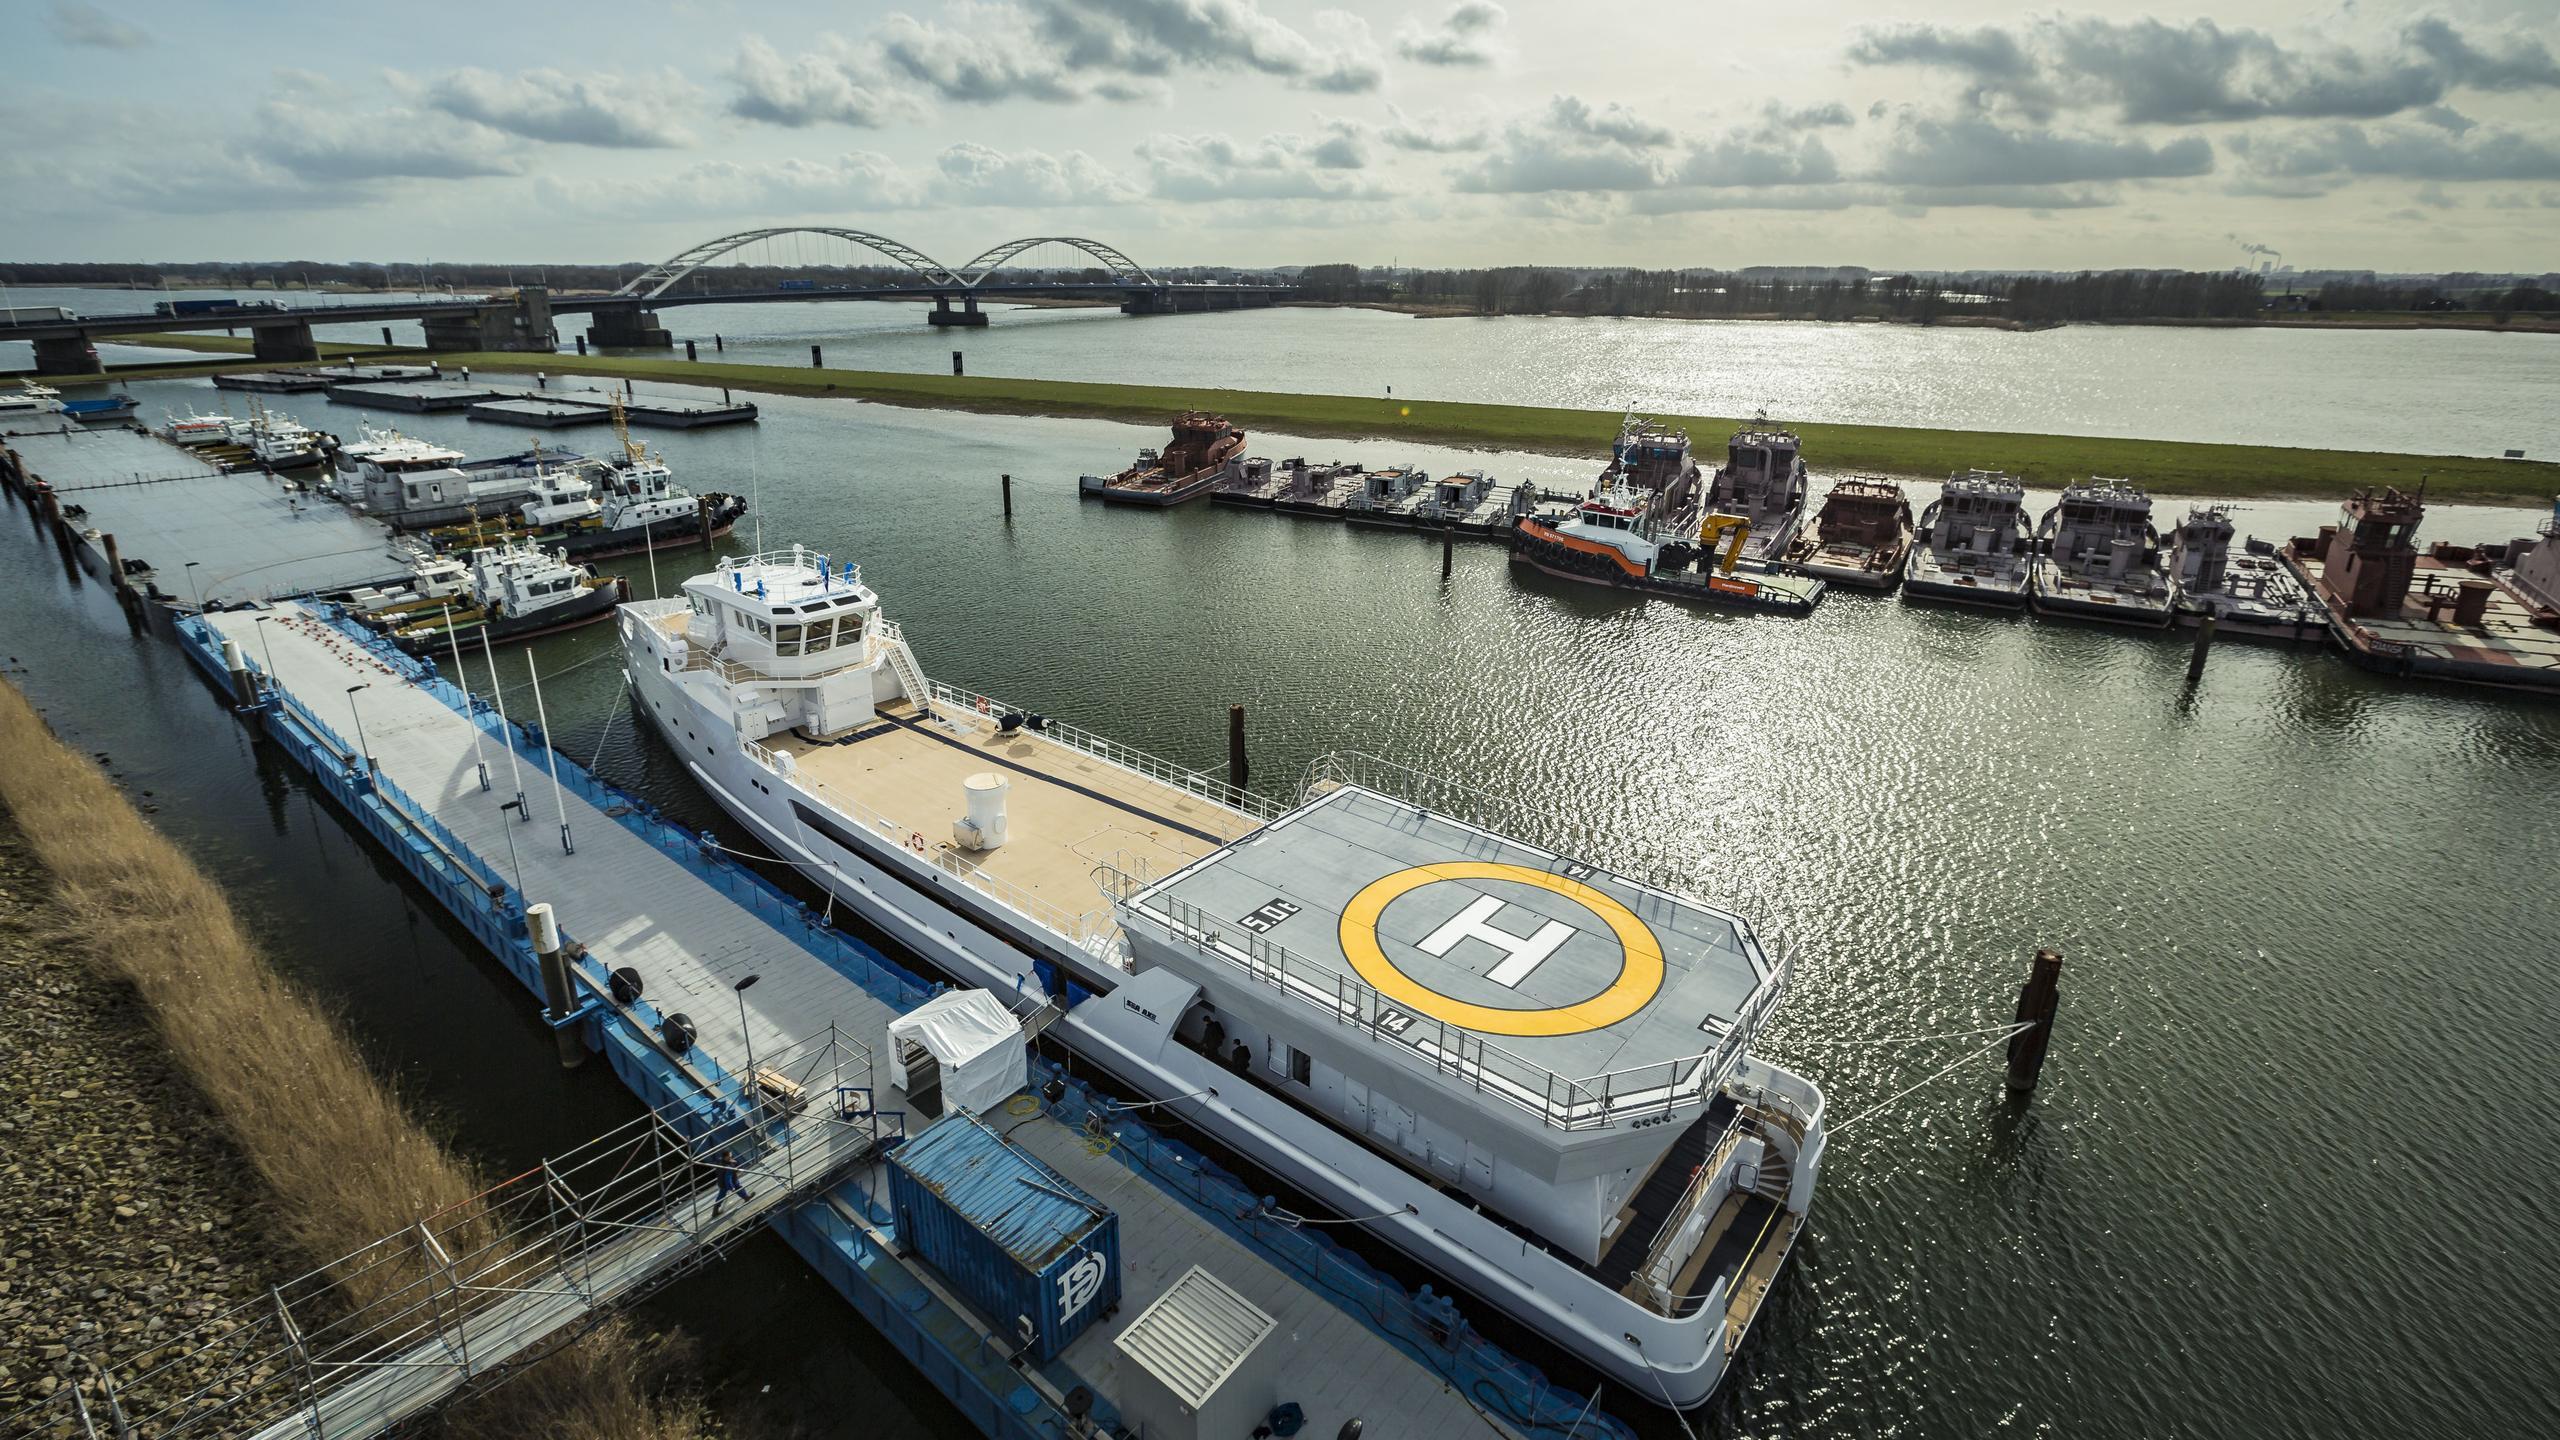 game changer support motoryacht damen seaaxe 69m 2017 half stern launch